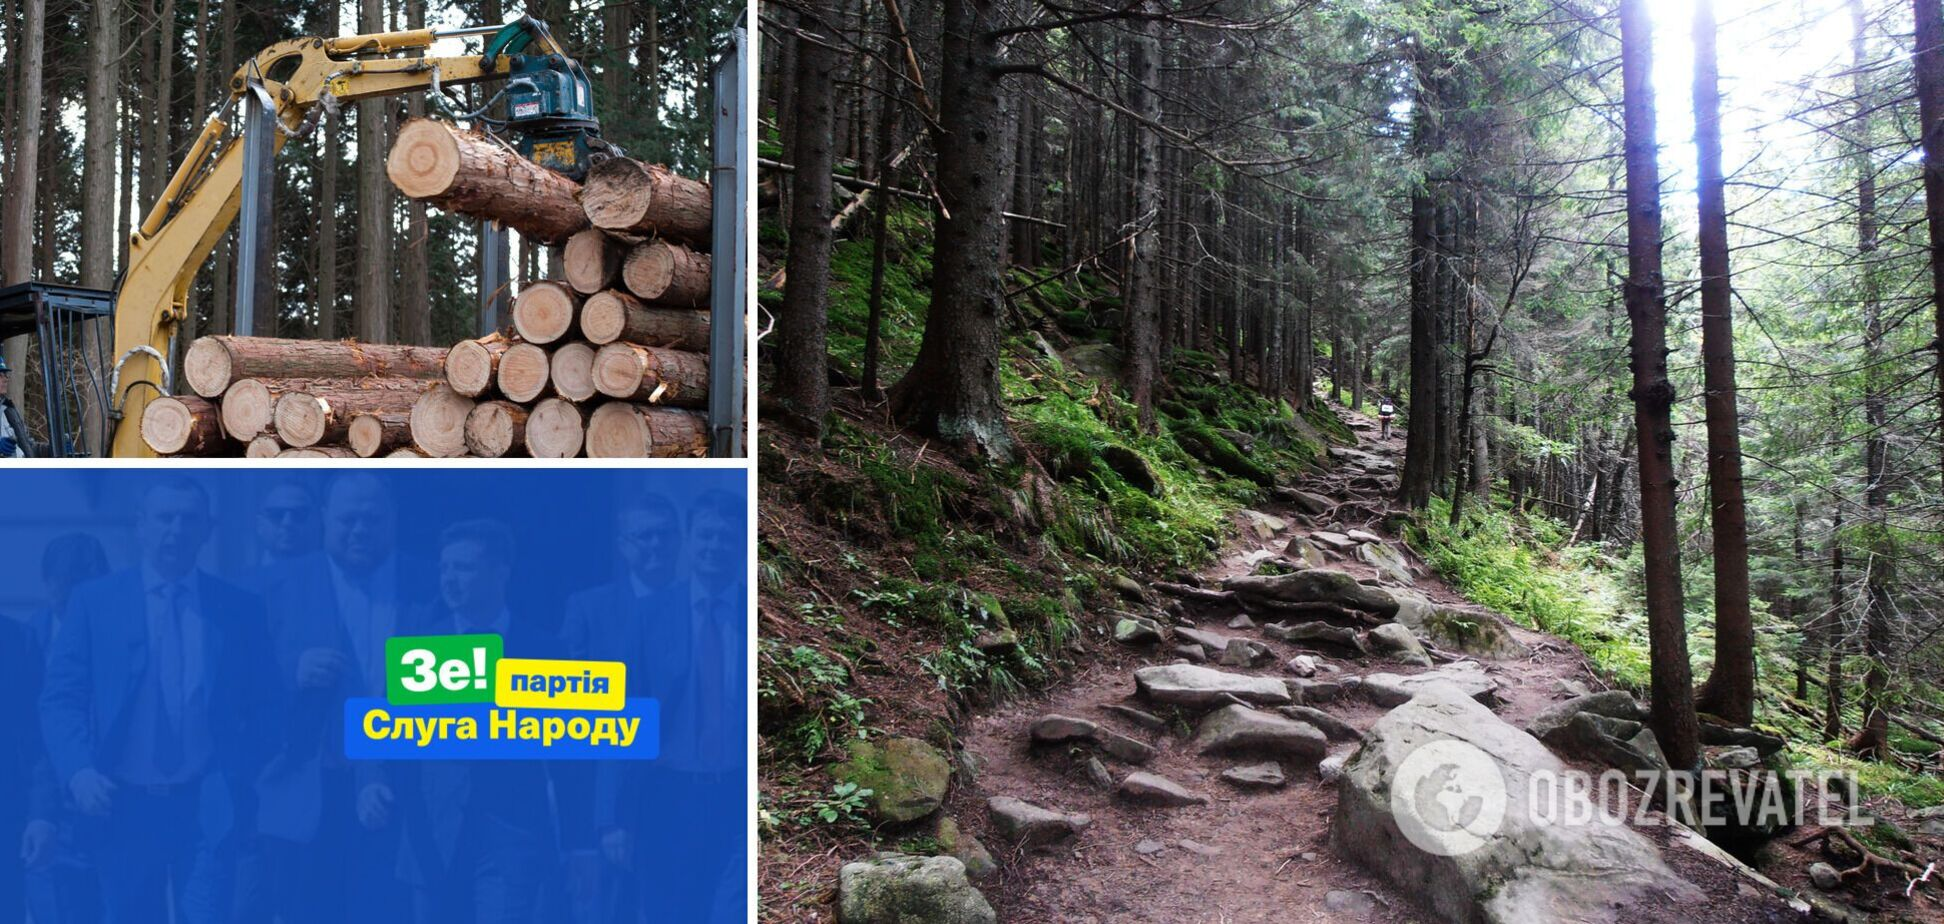 'Слуги народа' хотят отменить мораторий на экспорт леса-кругляка